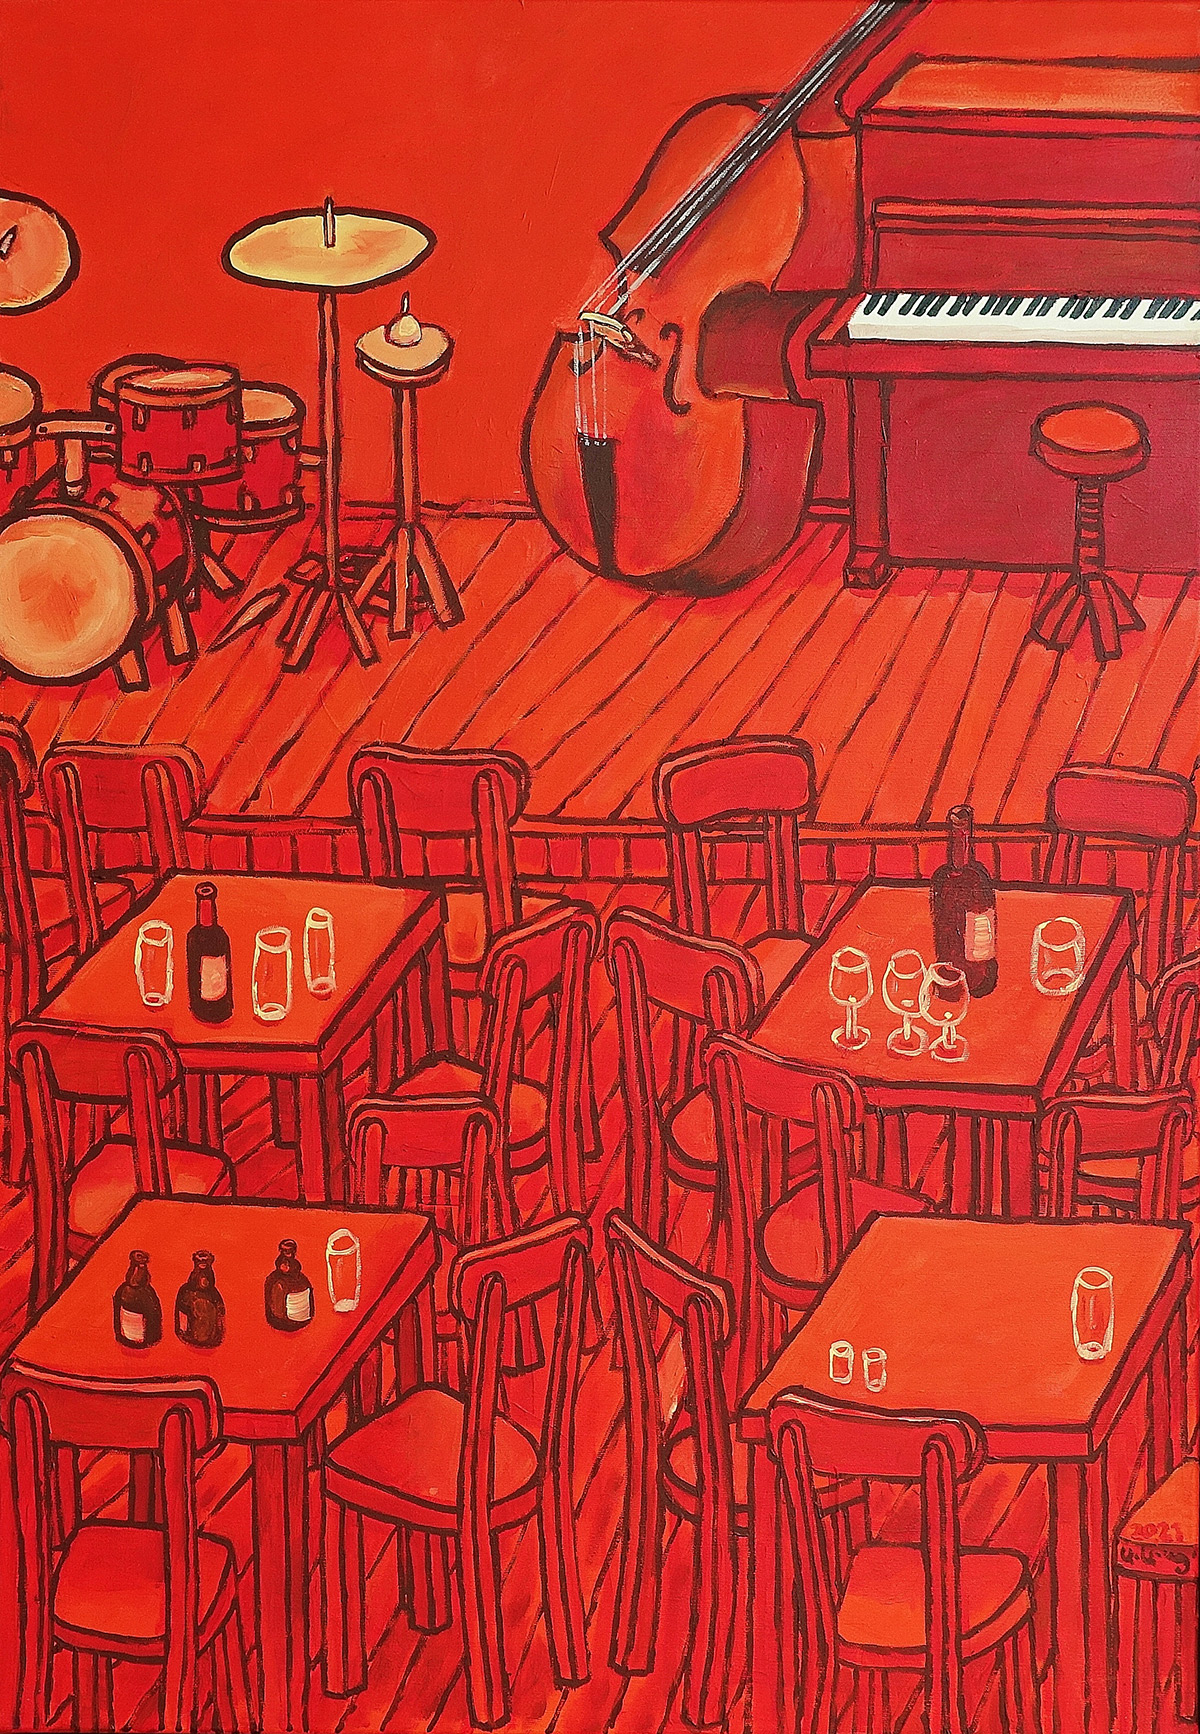 Krzysztof Kokoryn - Red pub